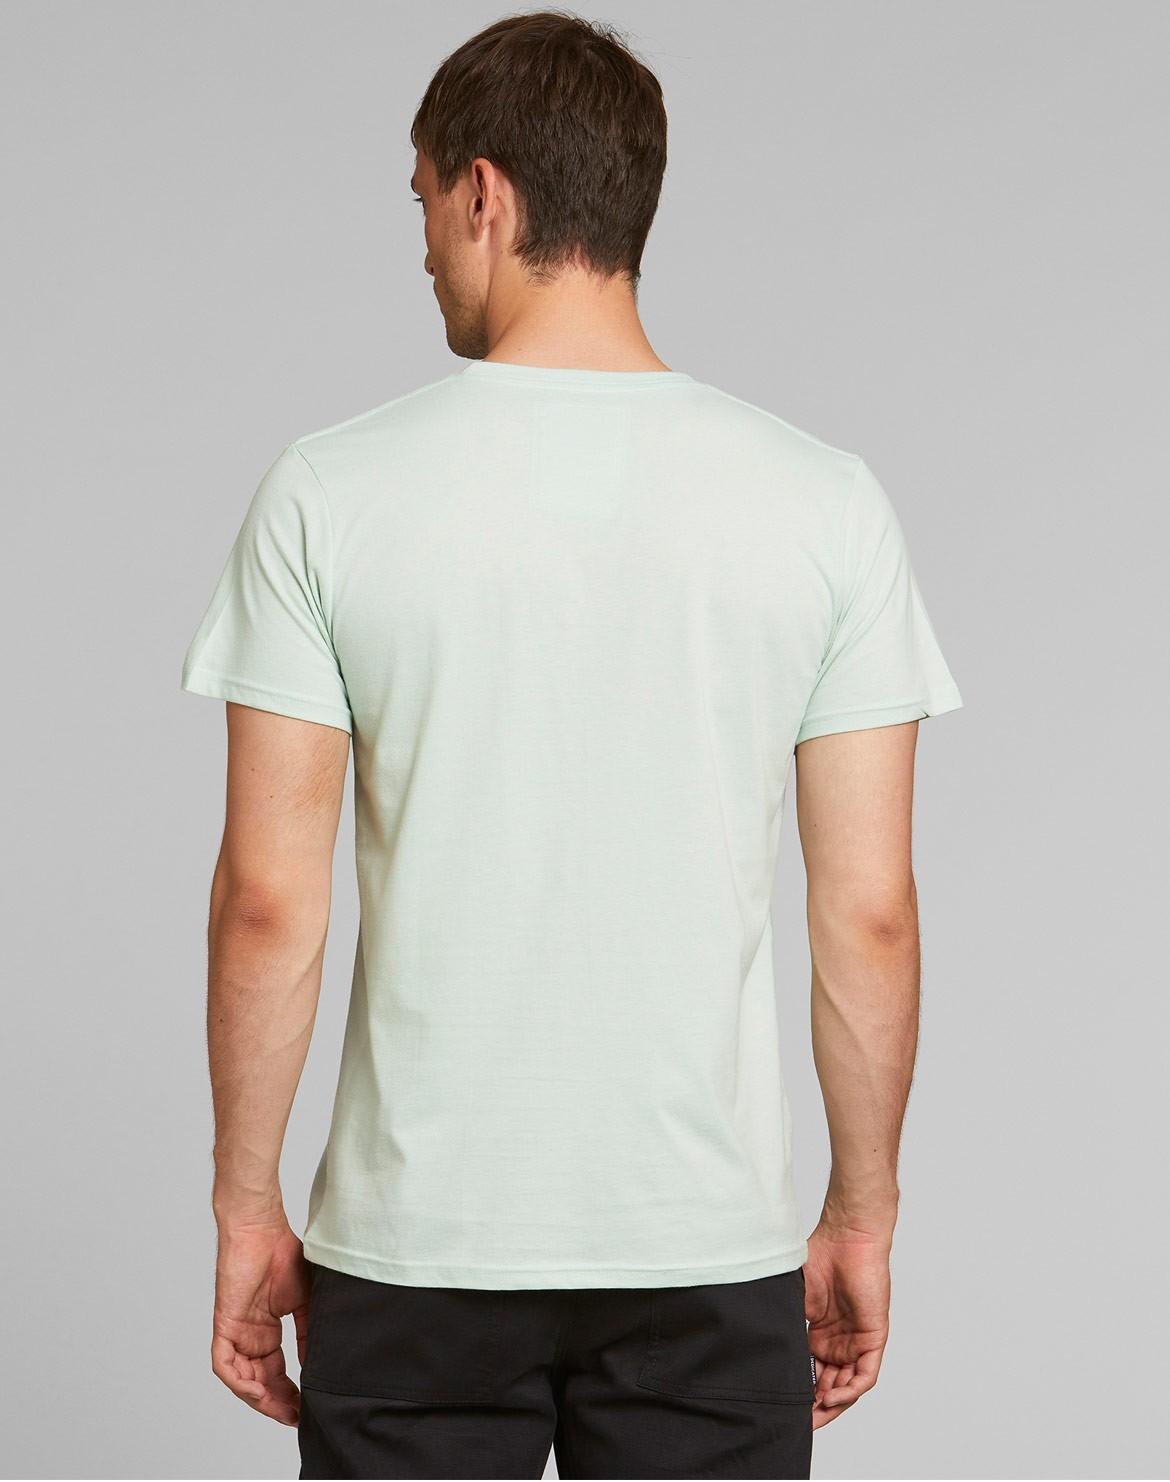 Stockholm T-Shirt Simplicity Bike